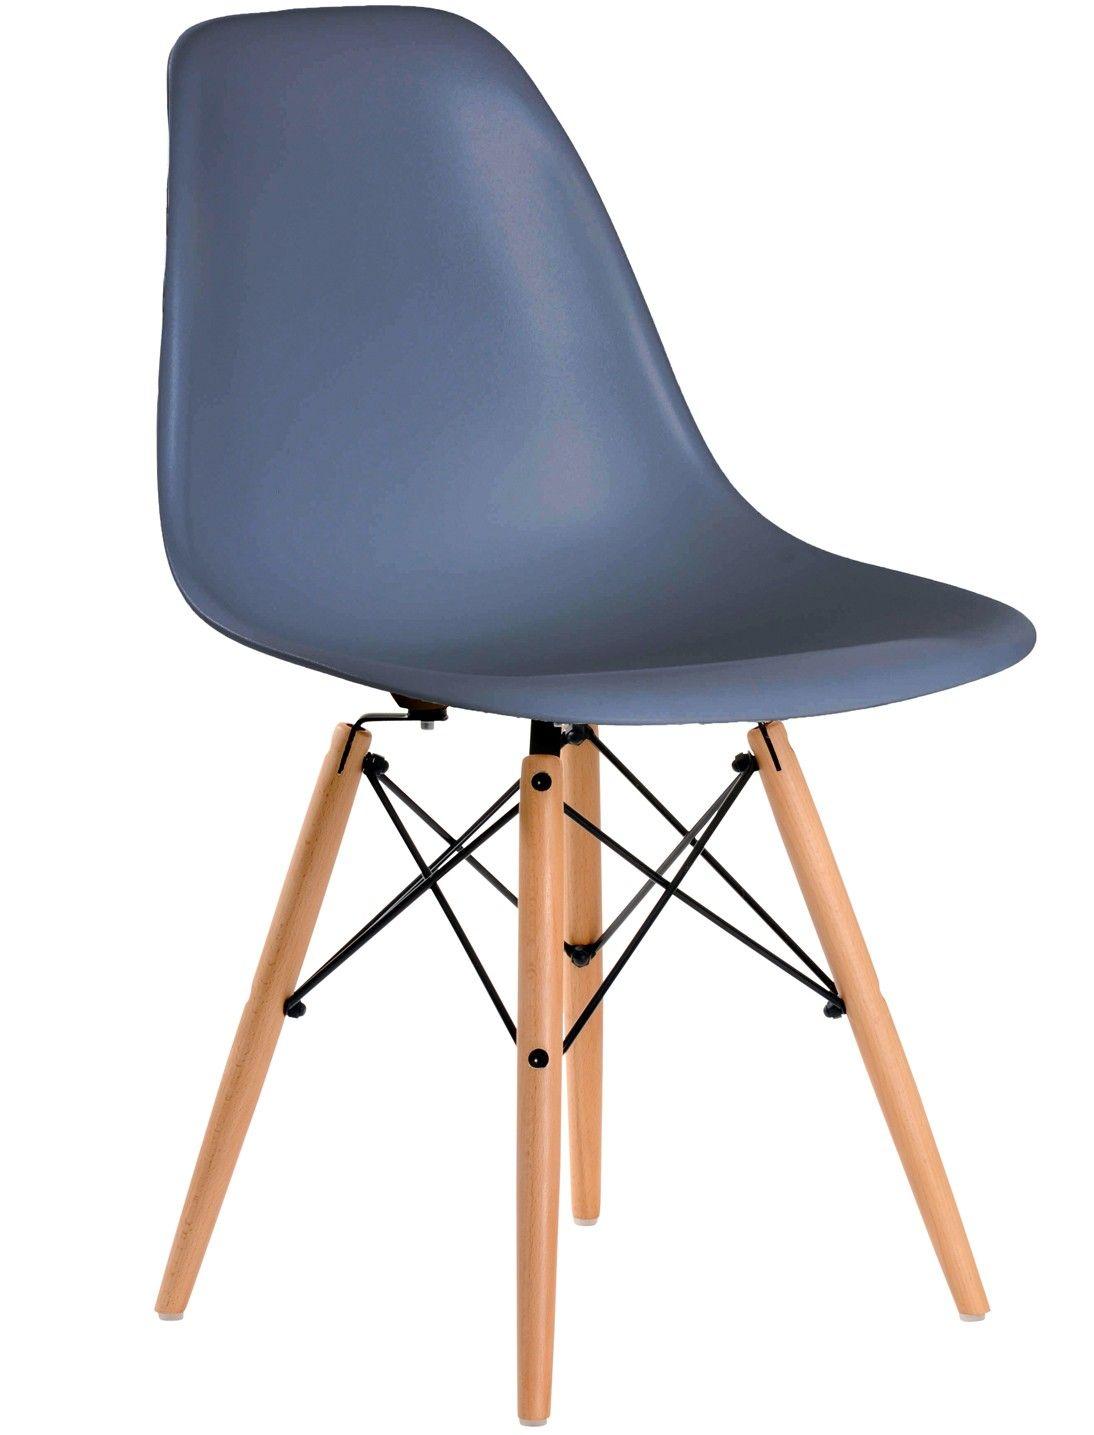 Eames DSW Chair Stühle Stühle Goodfurn Eames